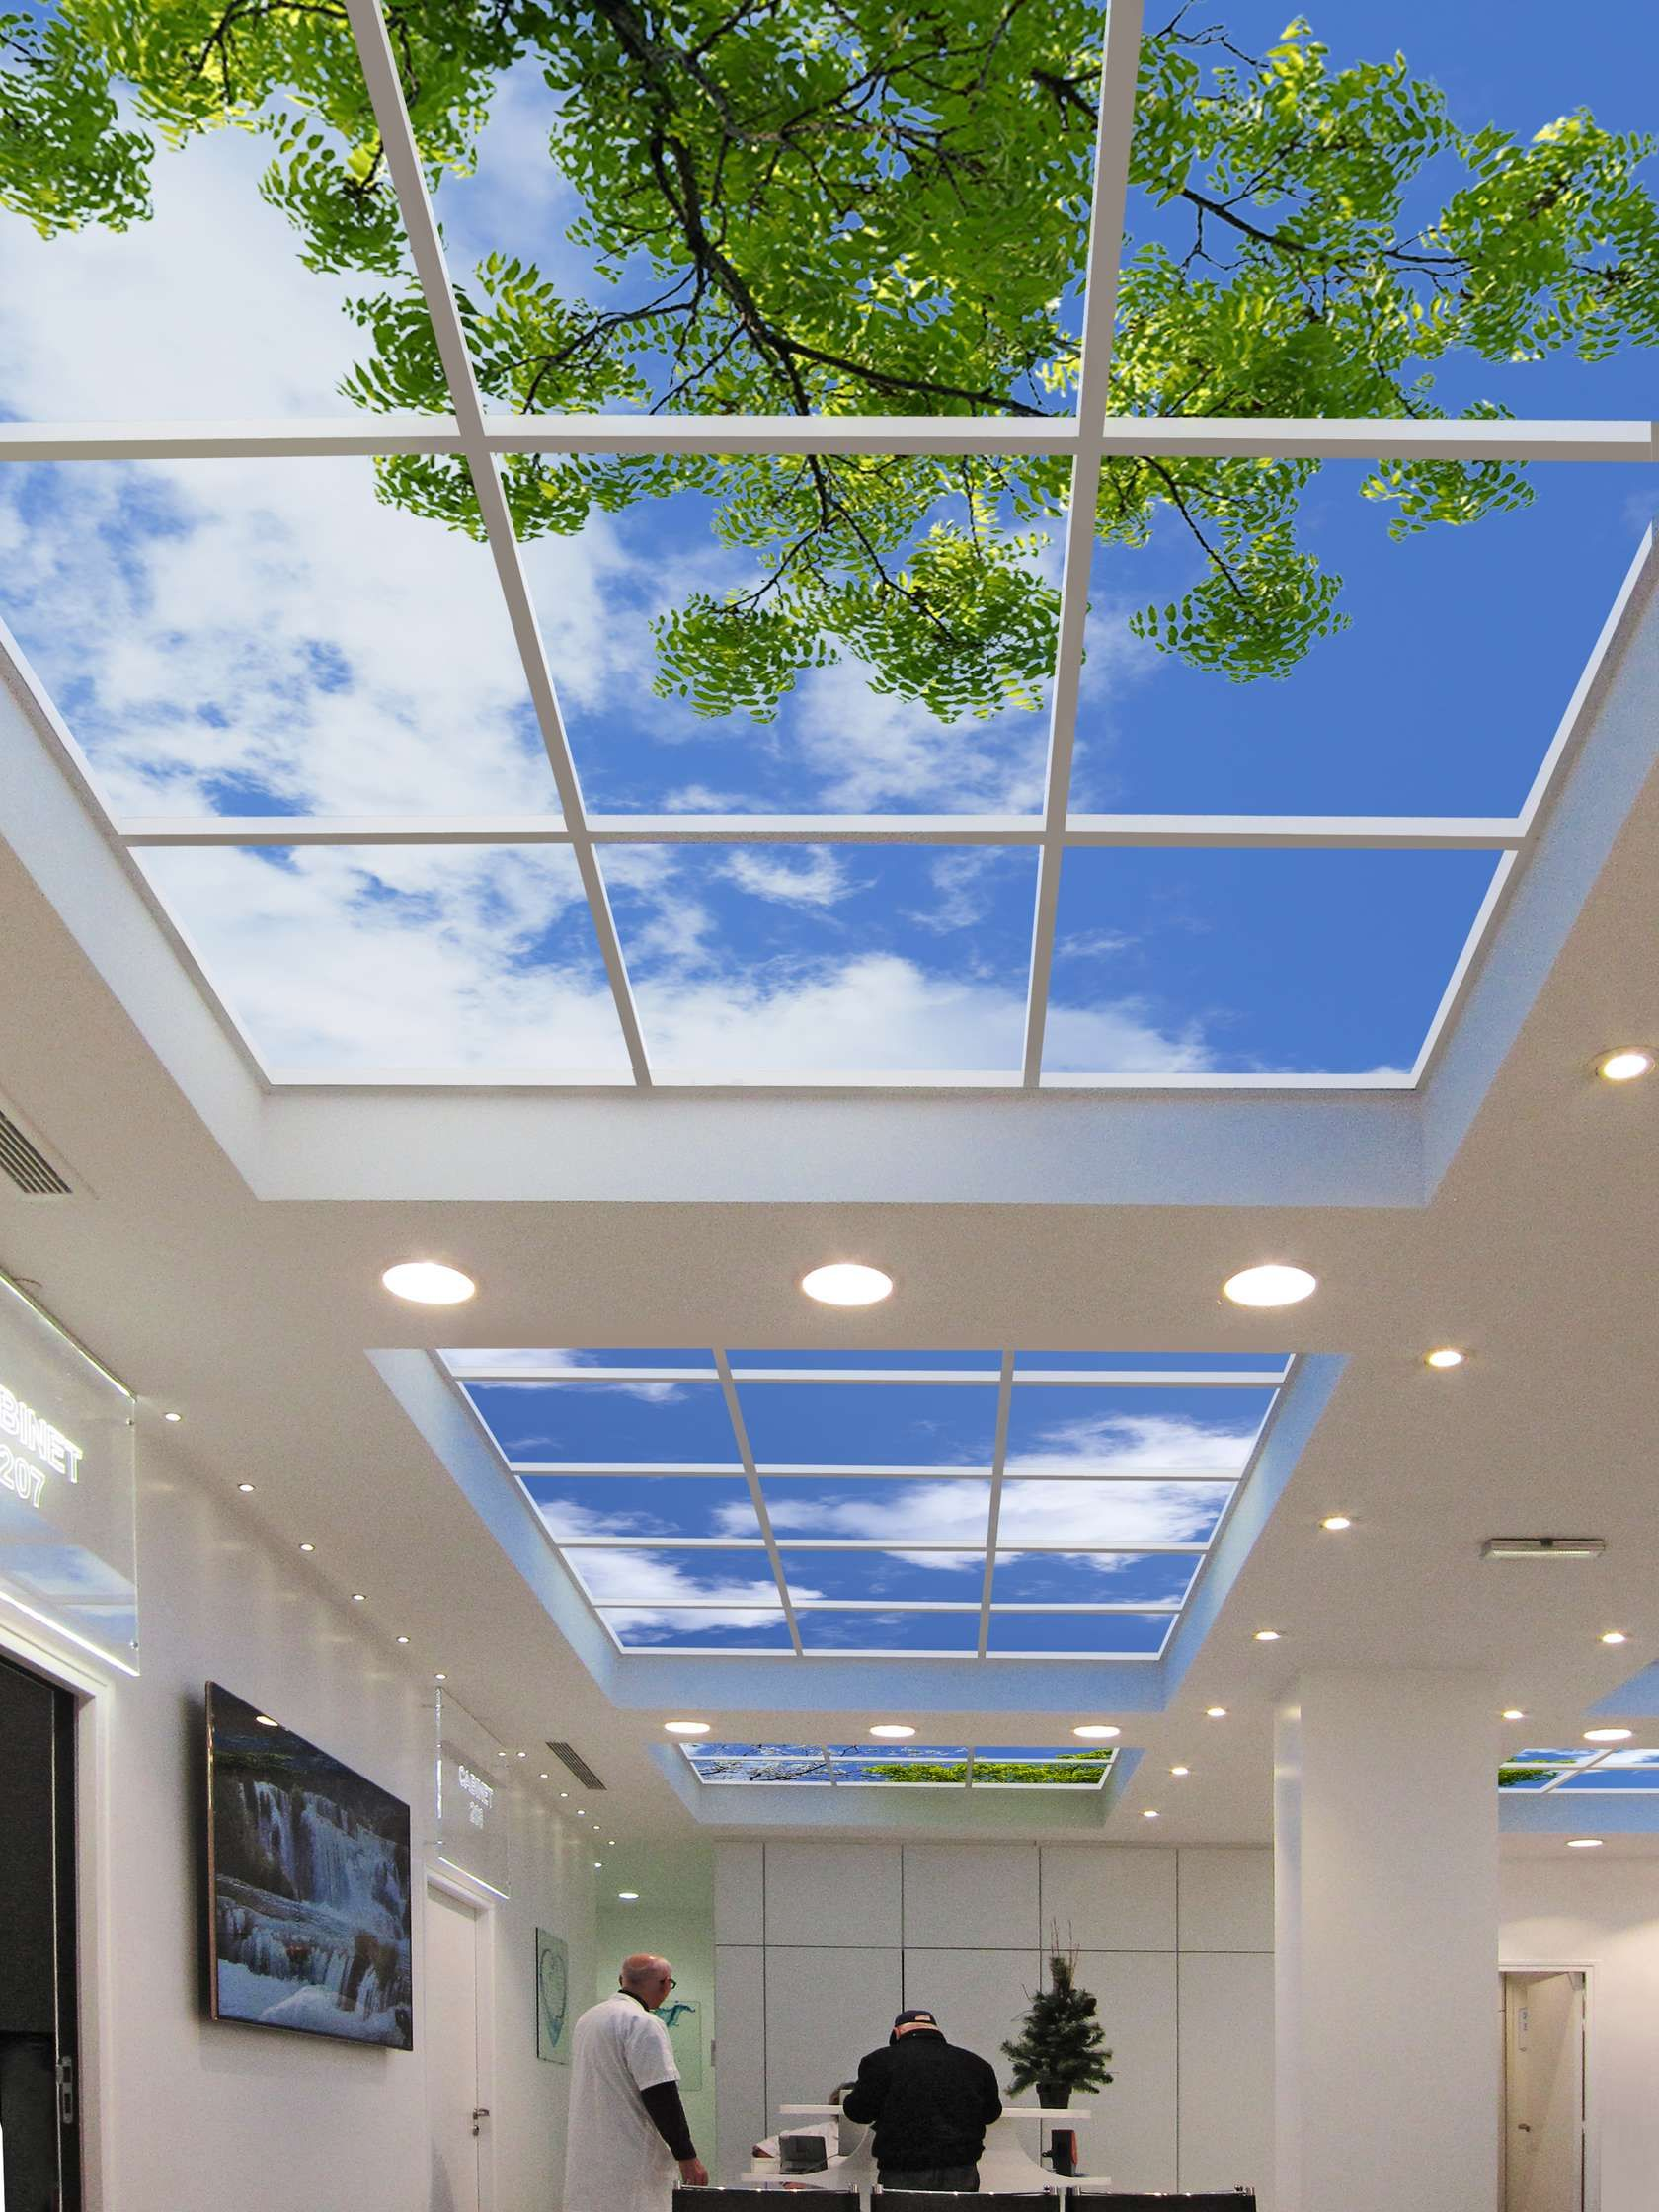 Sky Factory Luminous Skyceilings Virtual Skylights Faithfully Reproduce The Subtle Visual Stimuli Of Real These Award Winning Use Fac